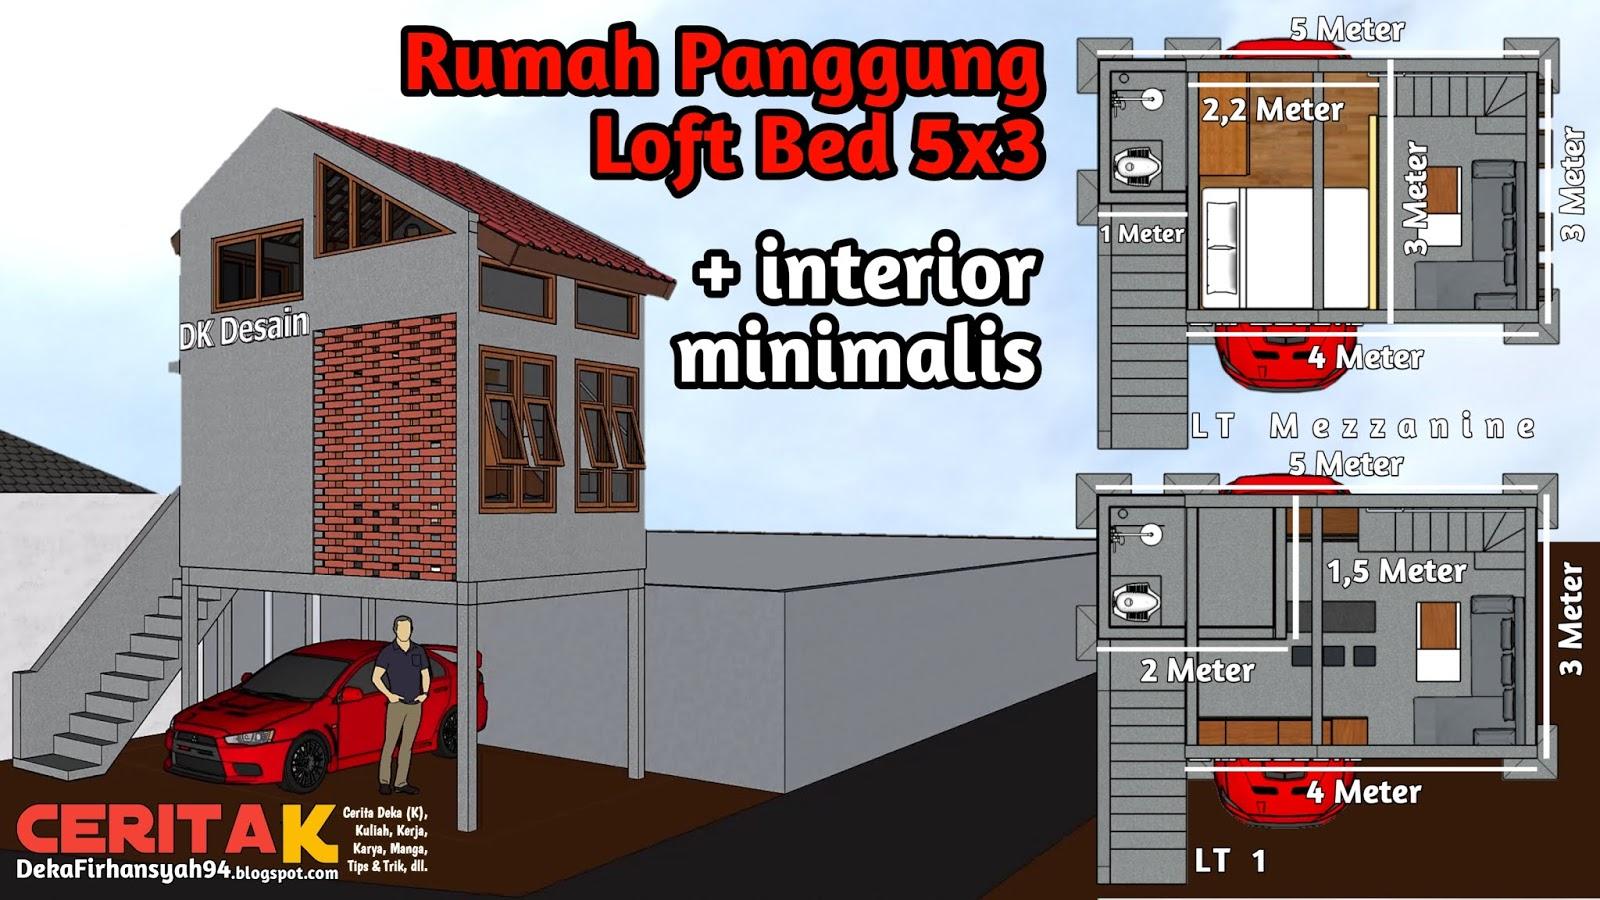 Desain Tiny House 5x3 Loft Bed